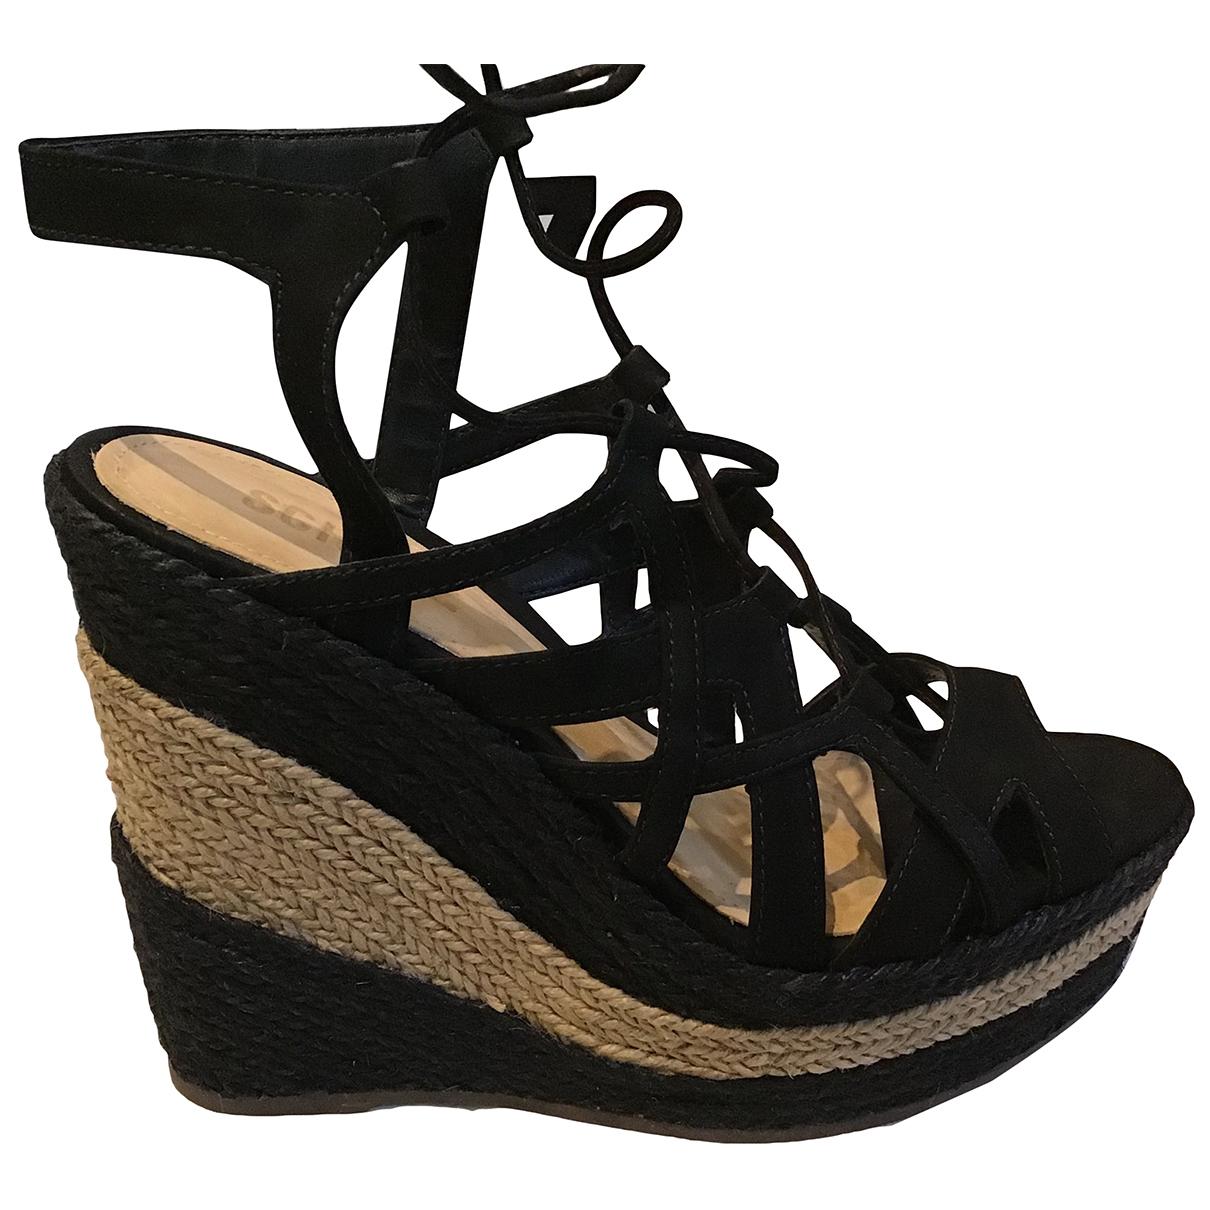 Schutz \N Black Suede Sandals for Women 38 EU